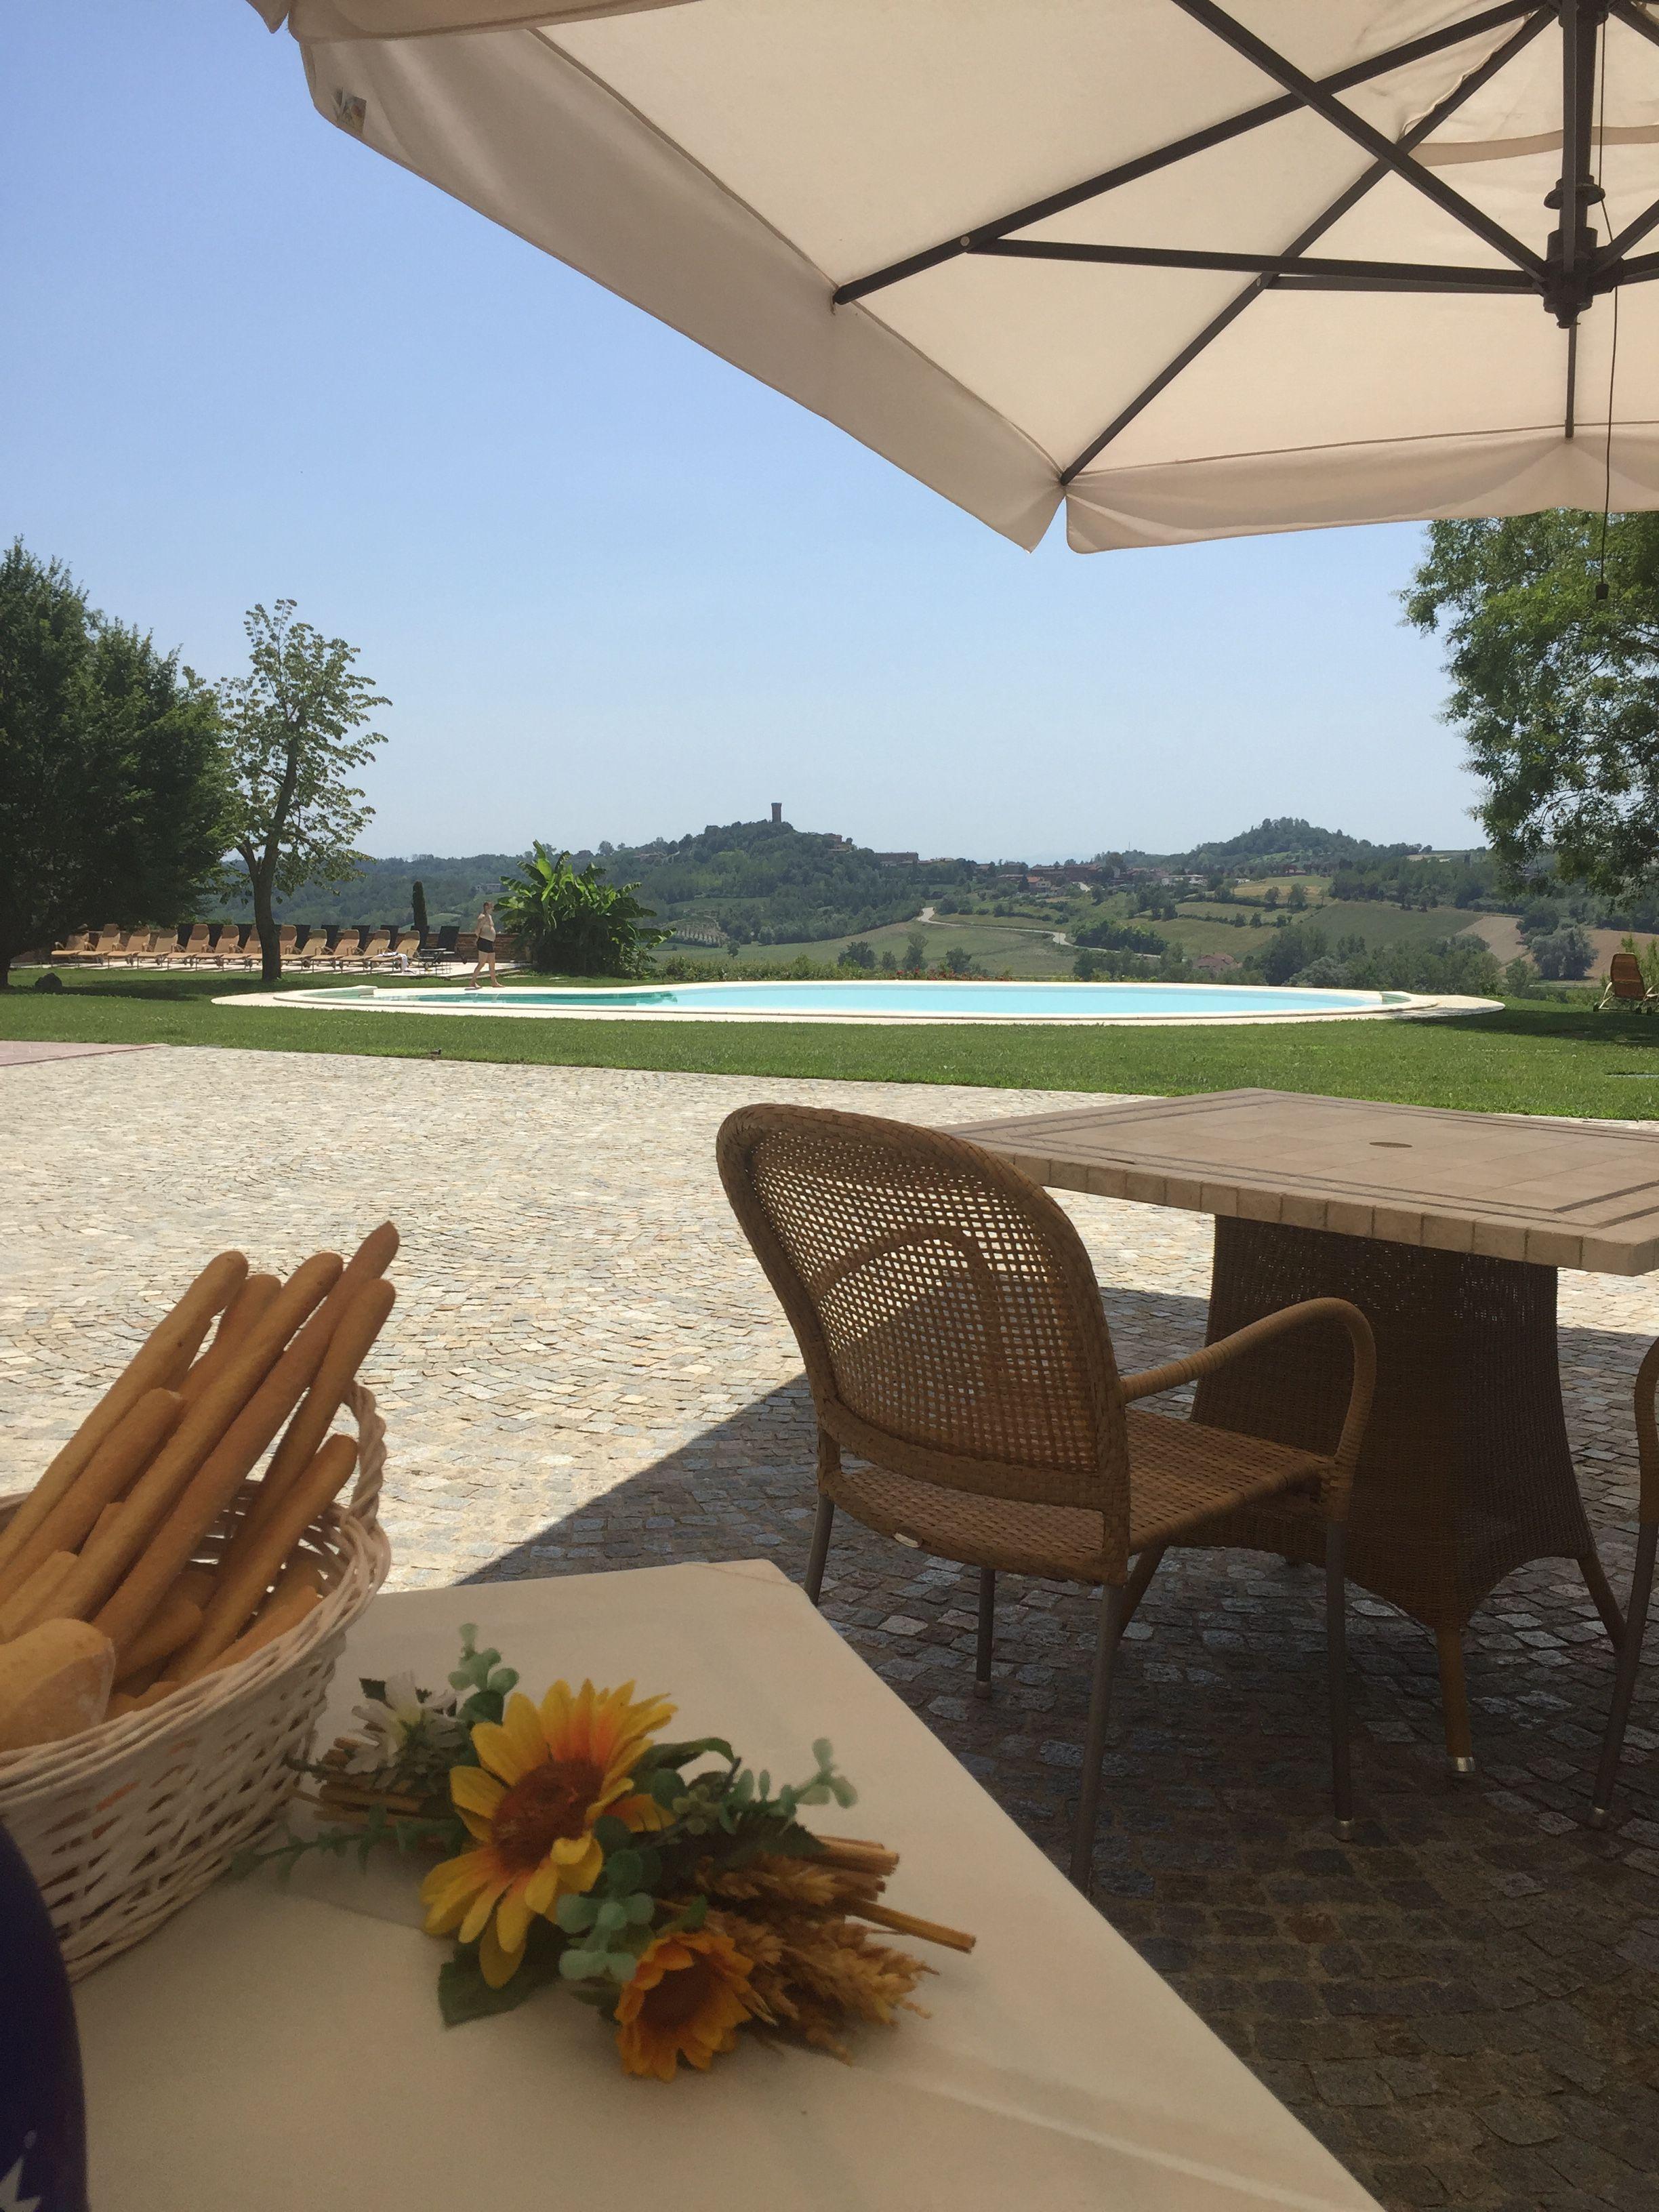 Relax in Langhe and Monferrato wine region  #italy #travel #trip #langhe #vacation #visititaly #italylife #luxury #luxurytravel #luxurylife #bestdestinations #taylormade #wine #italianwine #winetour #wineland #winery #barolo #relais #winerelais #unesco #unescoworldheritagesite